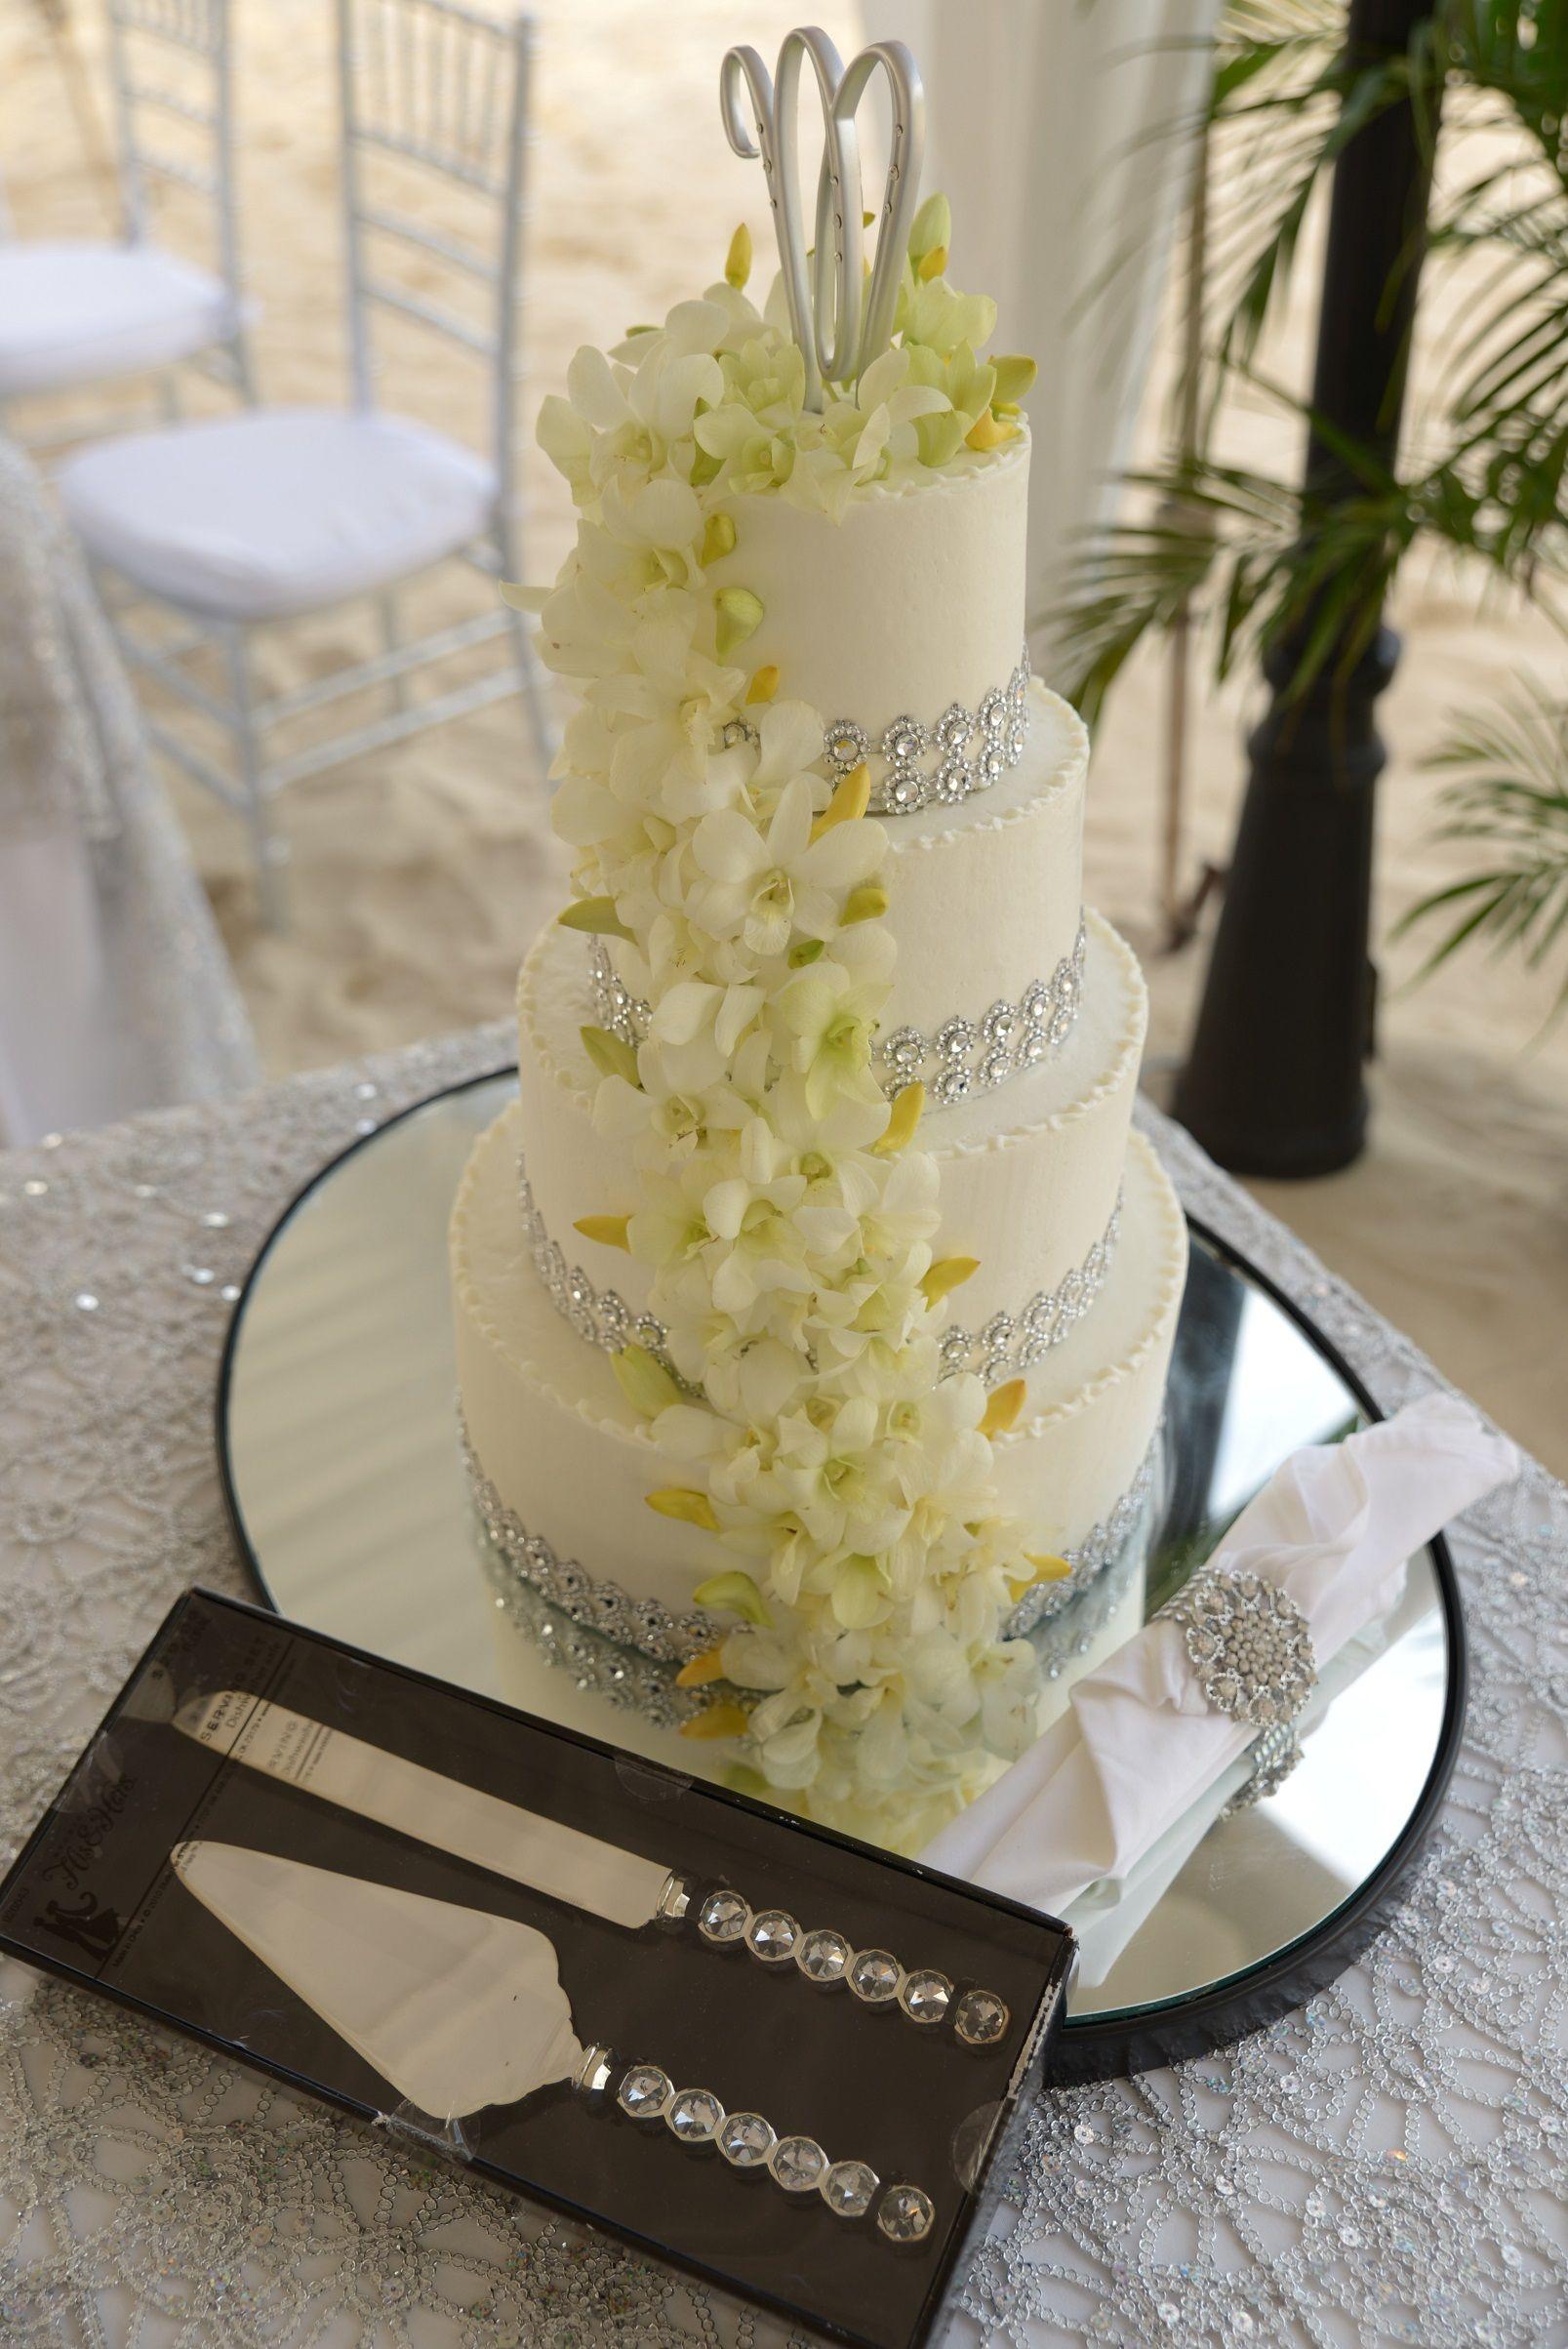 A Beautiful And Elegant Cake To Accent The Decor Perfectly Secretswildorchid Secretsstjames My Wedding In 2019 Wedding Destination Wedding Decor Nontra